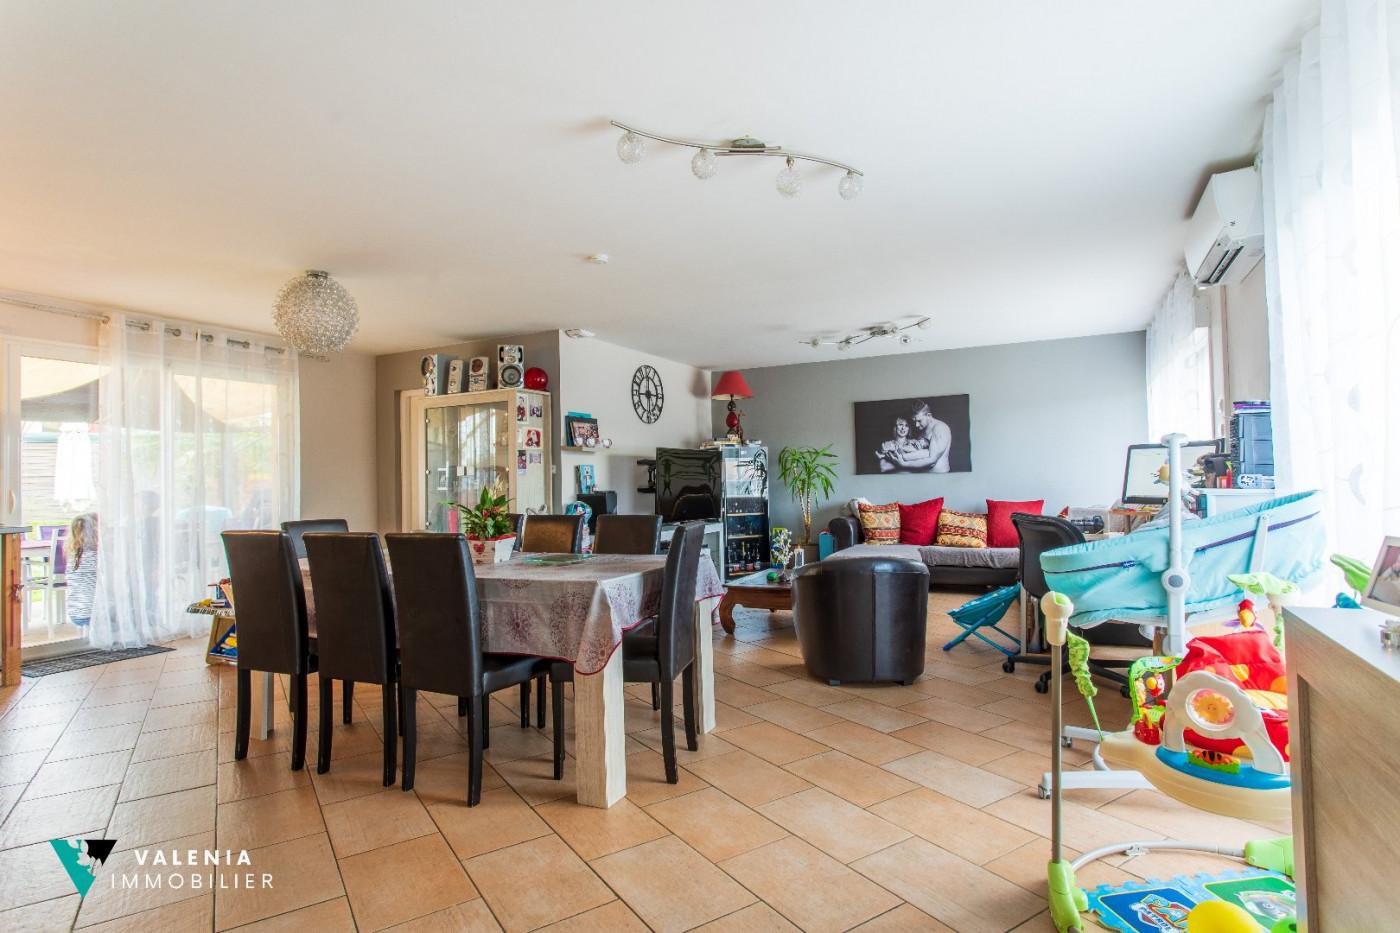 A vendre  Abzac | Réf 3453411320 - Valenia immobilier